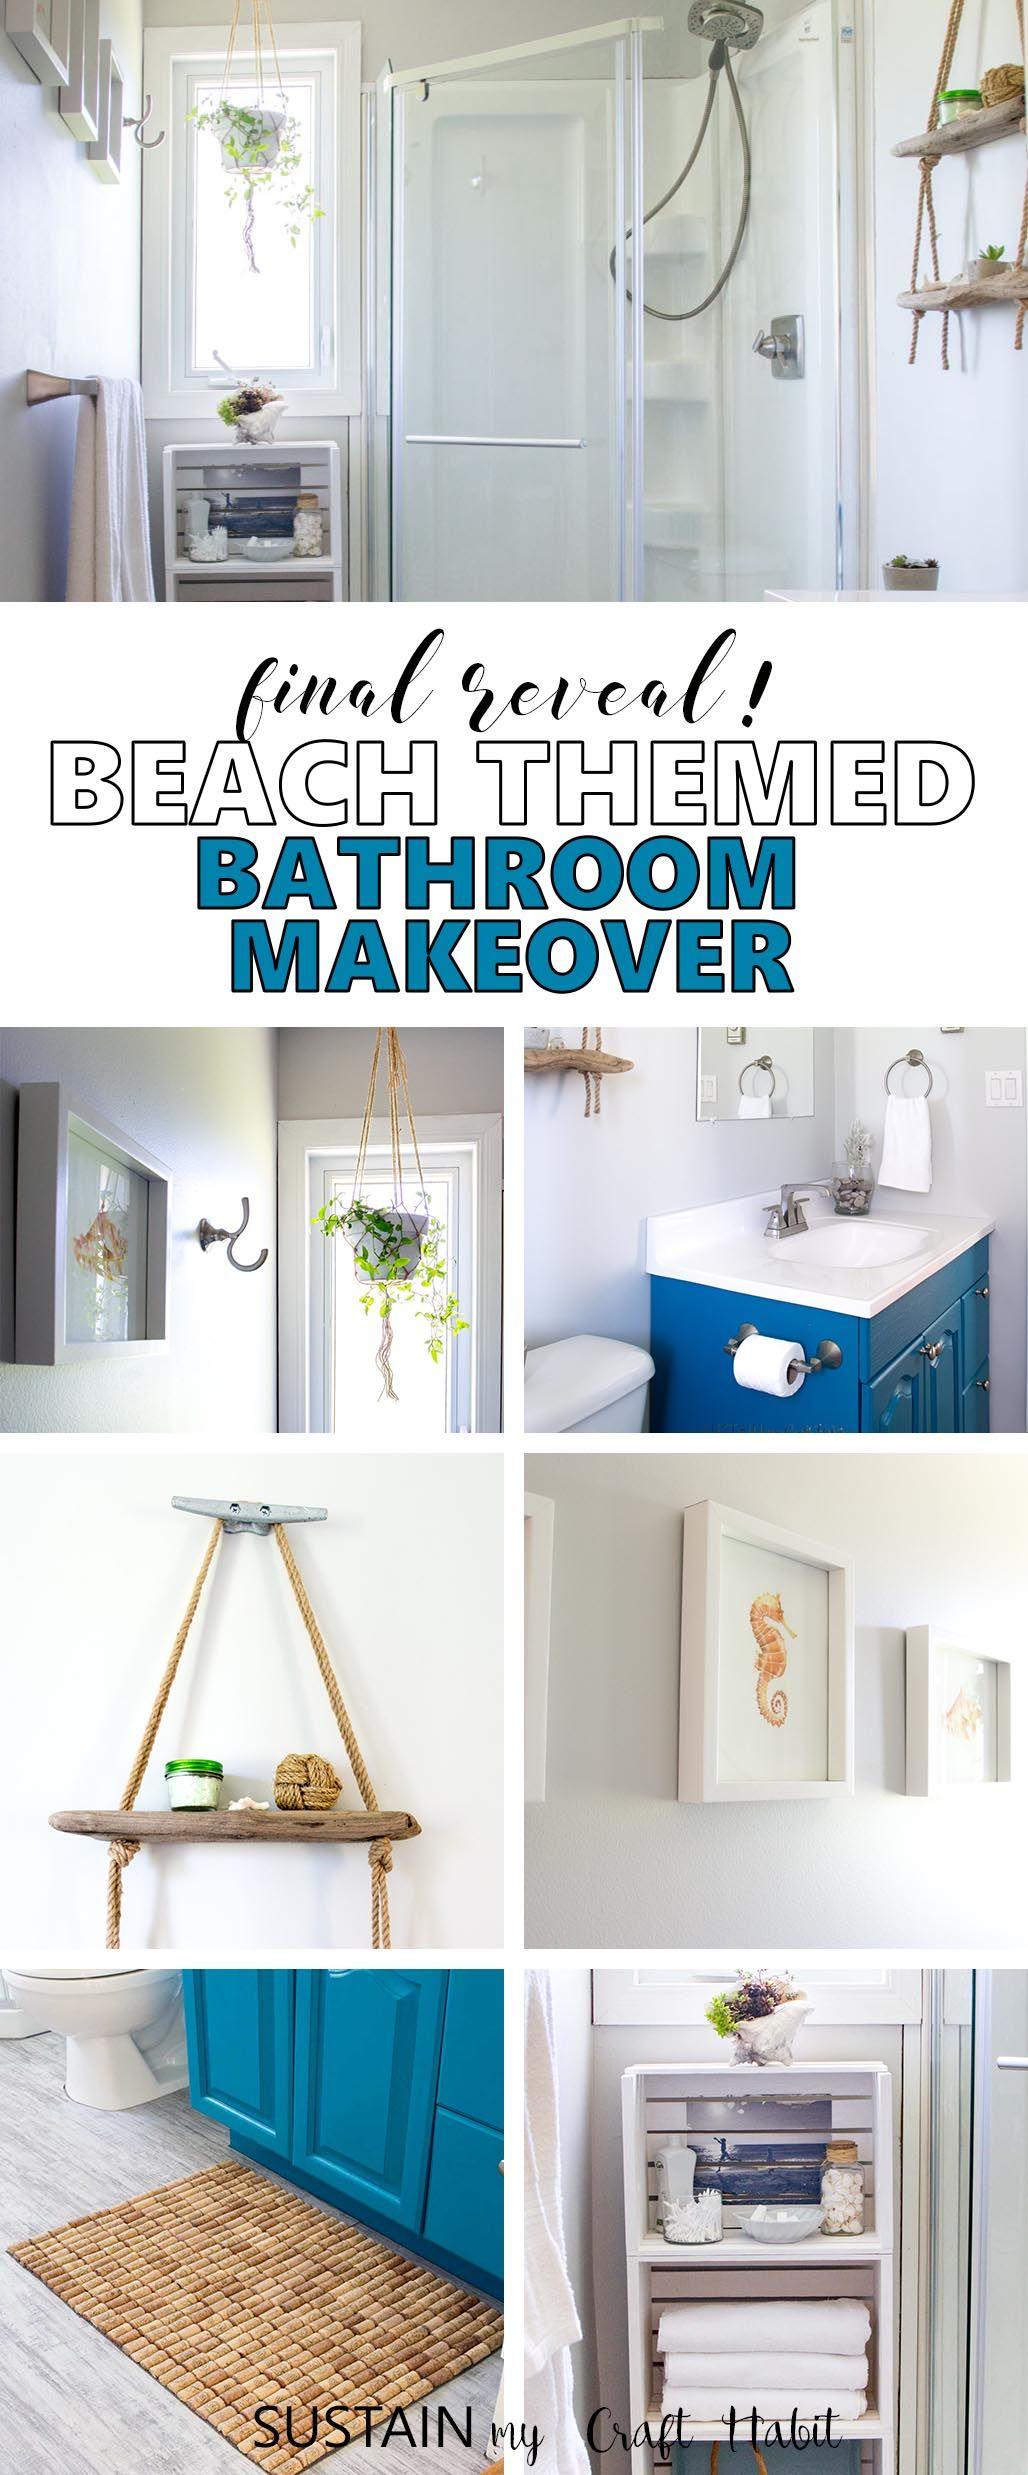 Budget Friendly Beach Themed Bathroom Makeover Beach Theme